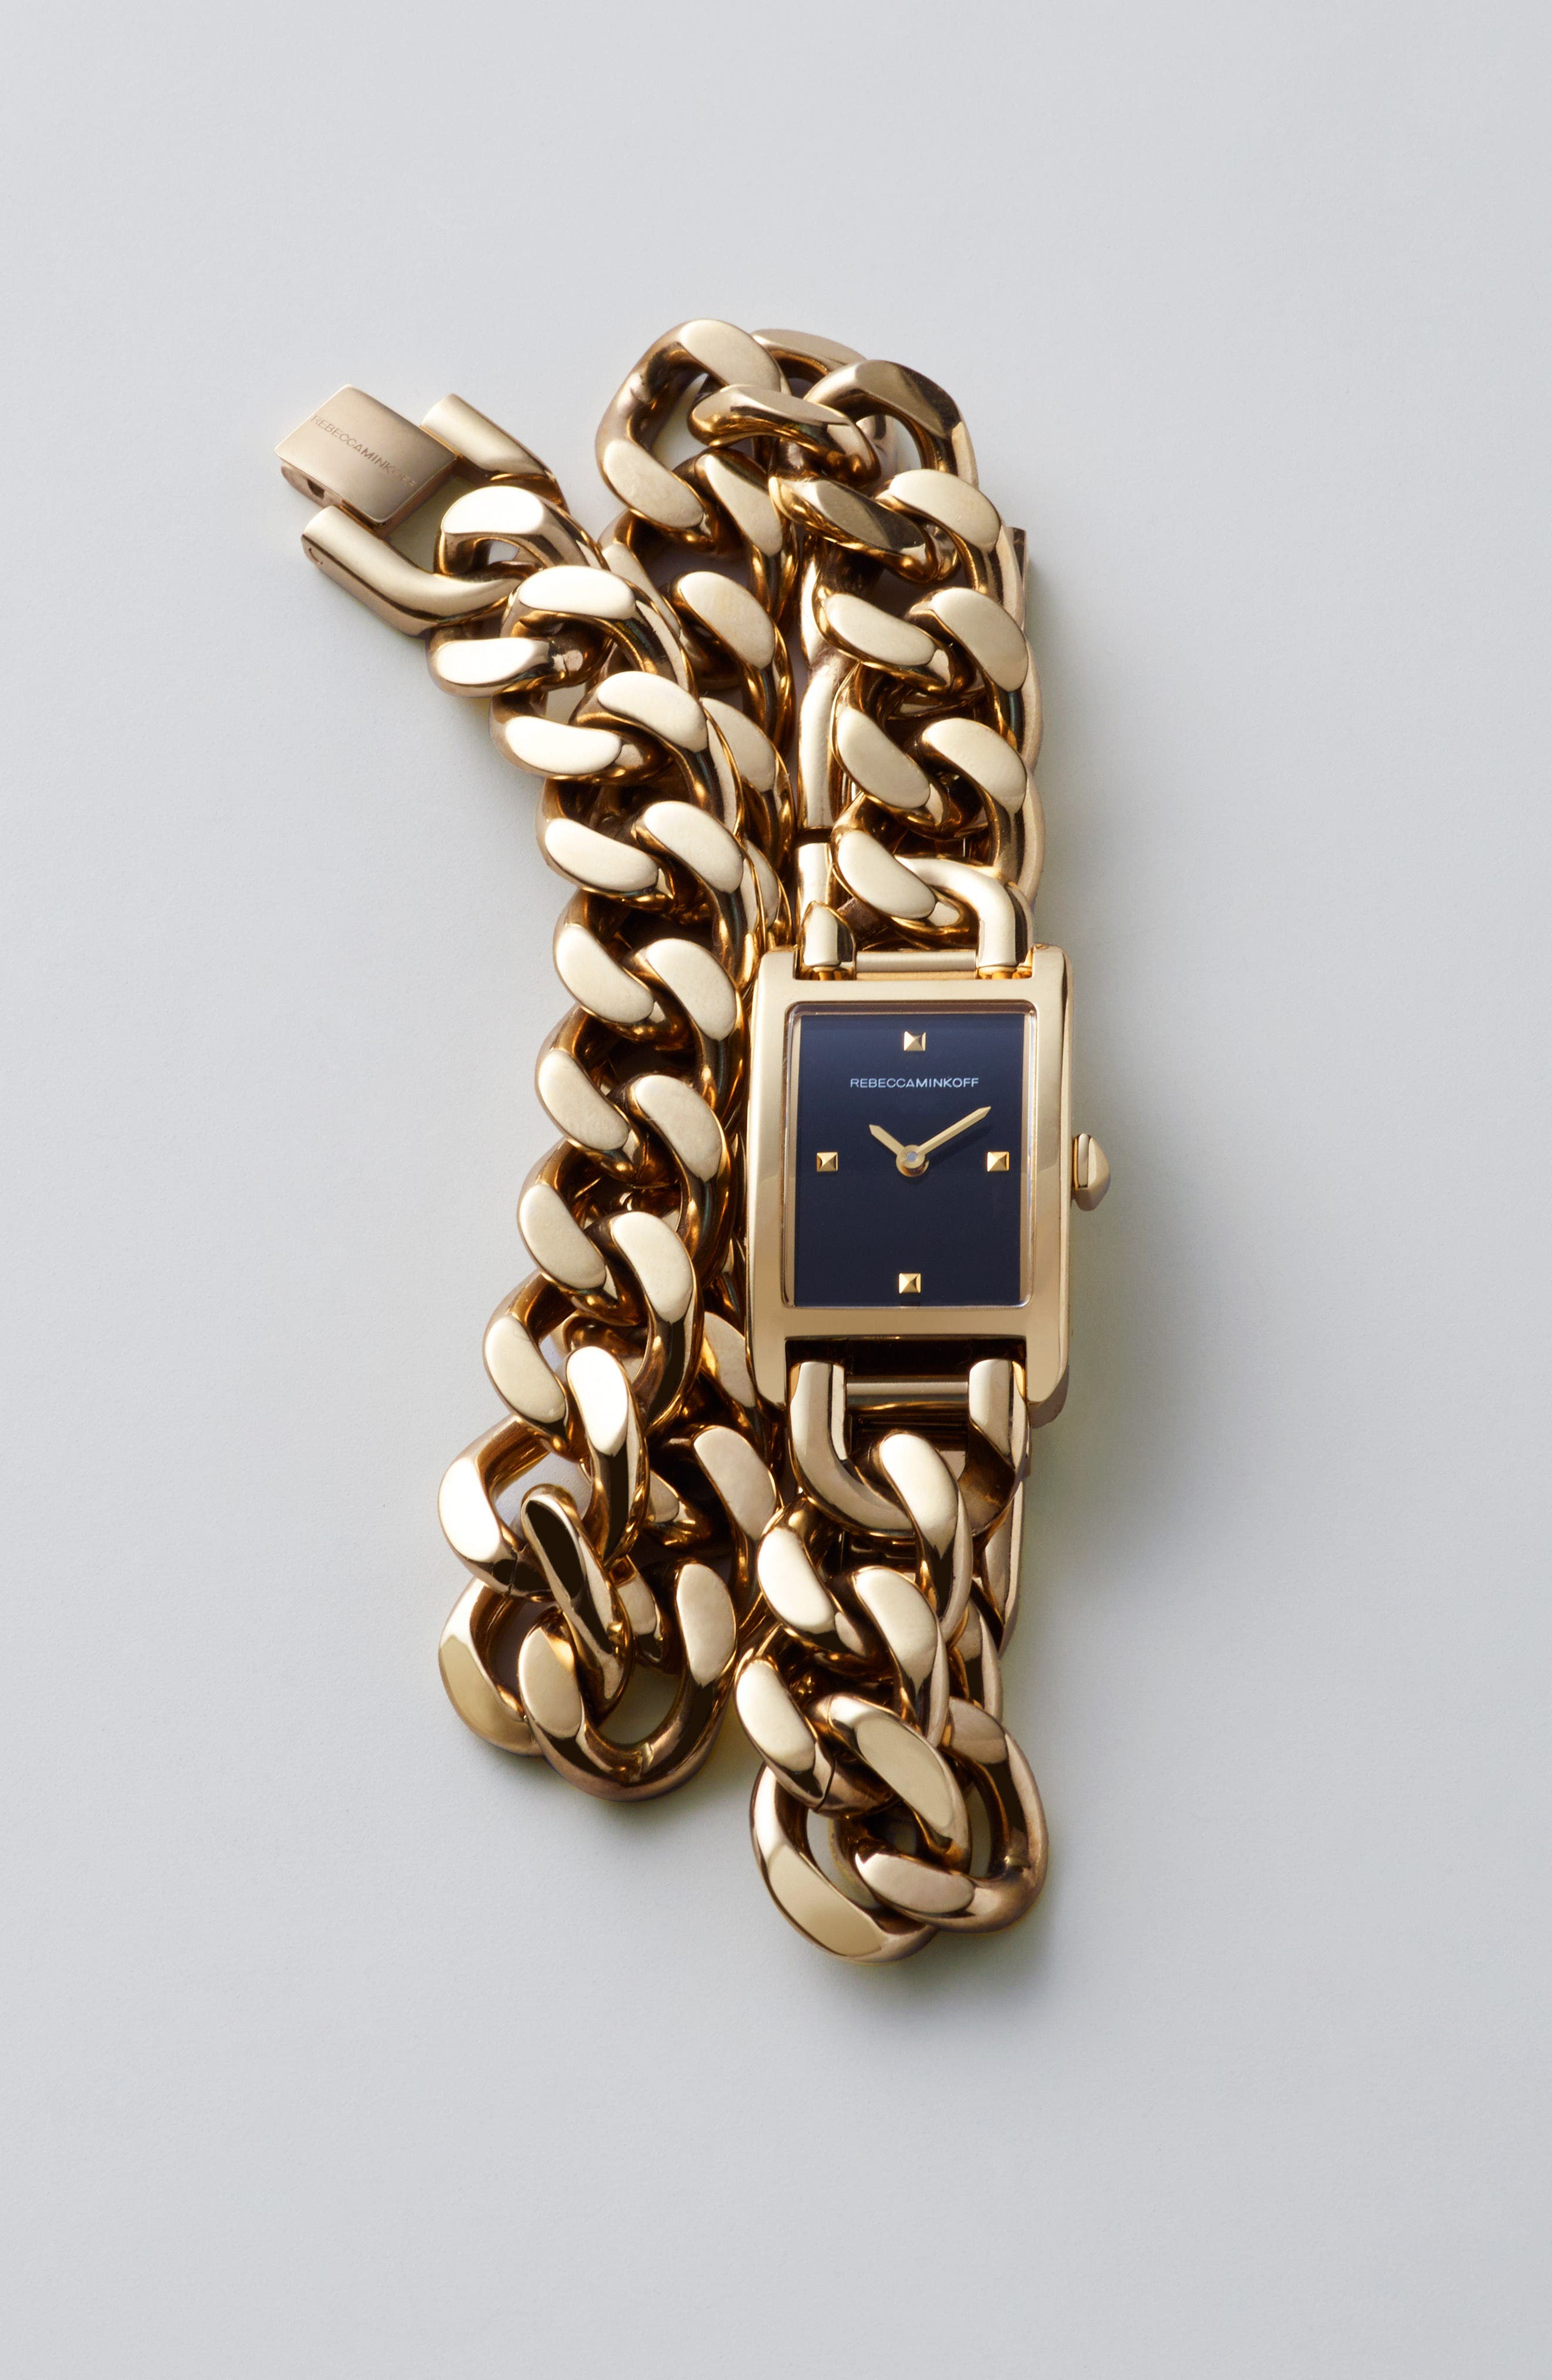 Moment Chain Wrap Bracelet Watch, 19mm x 30mm,                             Alternate thumbnail 6, color,                             GOLD/ BLACK/ GOLD